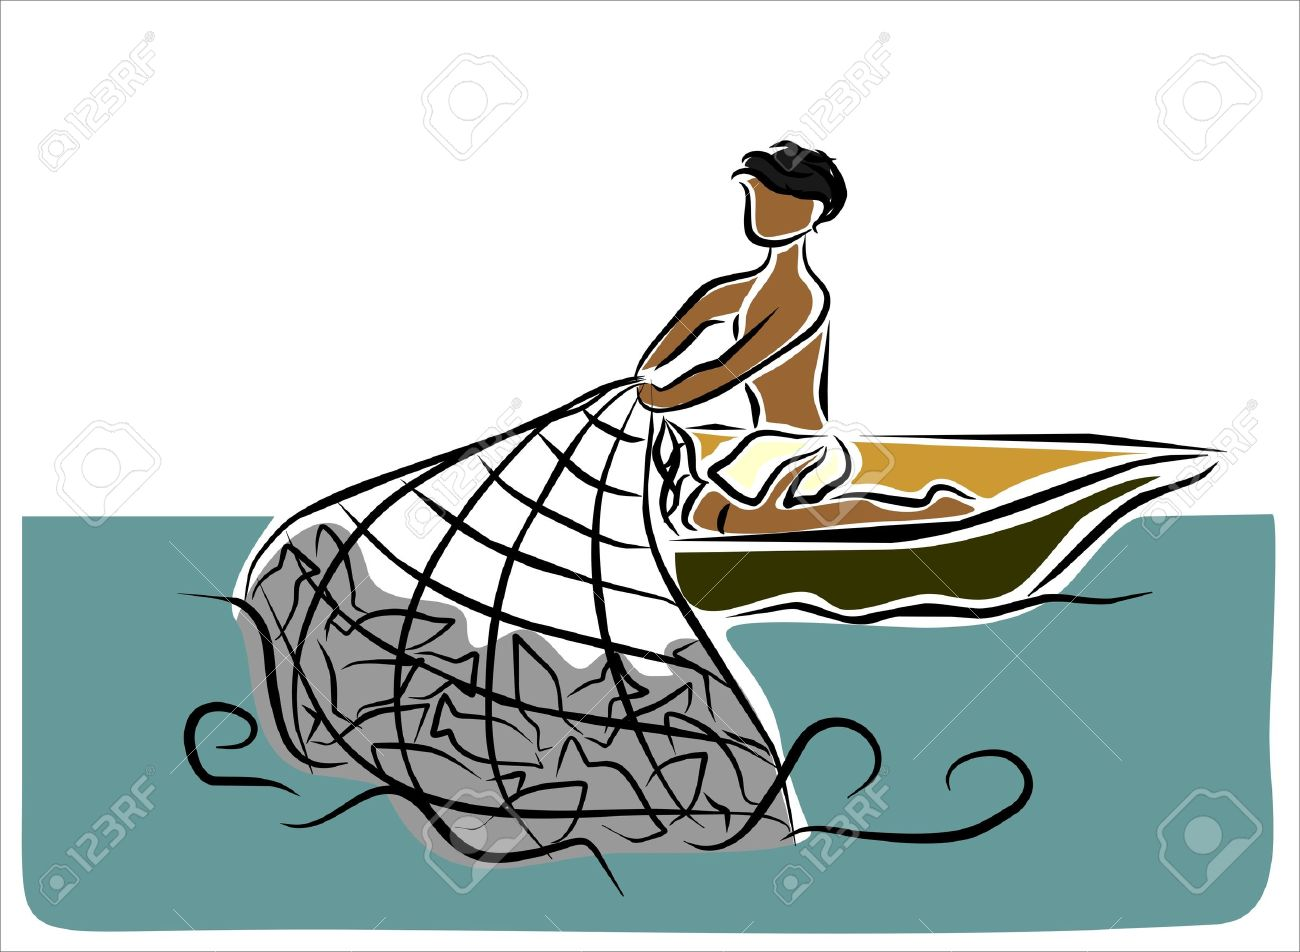 1300x952 Man Fishing In Boat Clipart